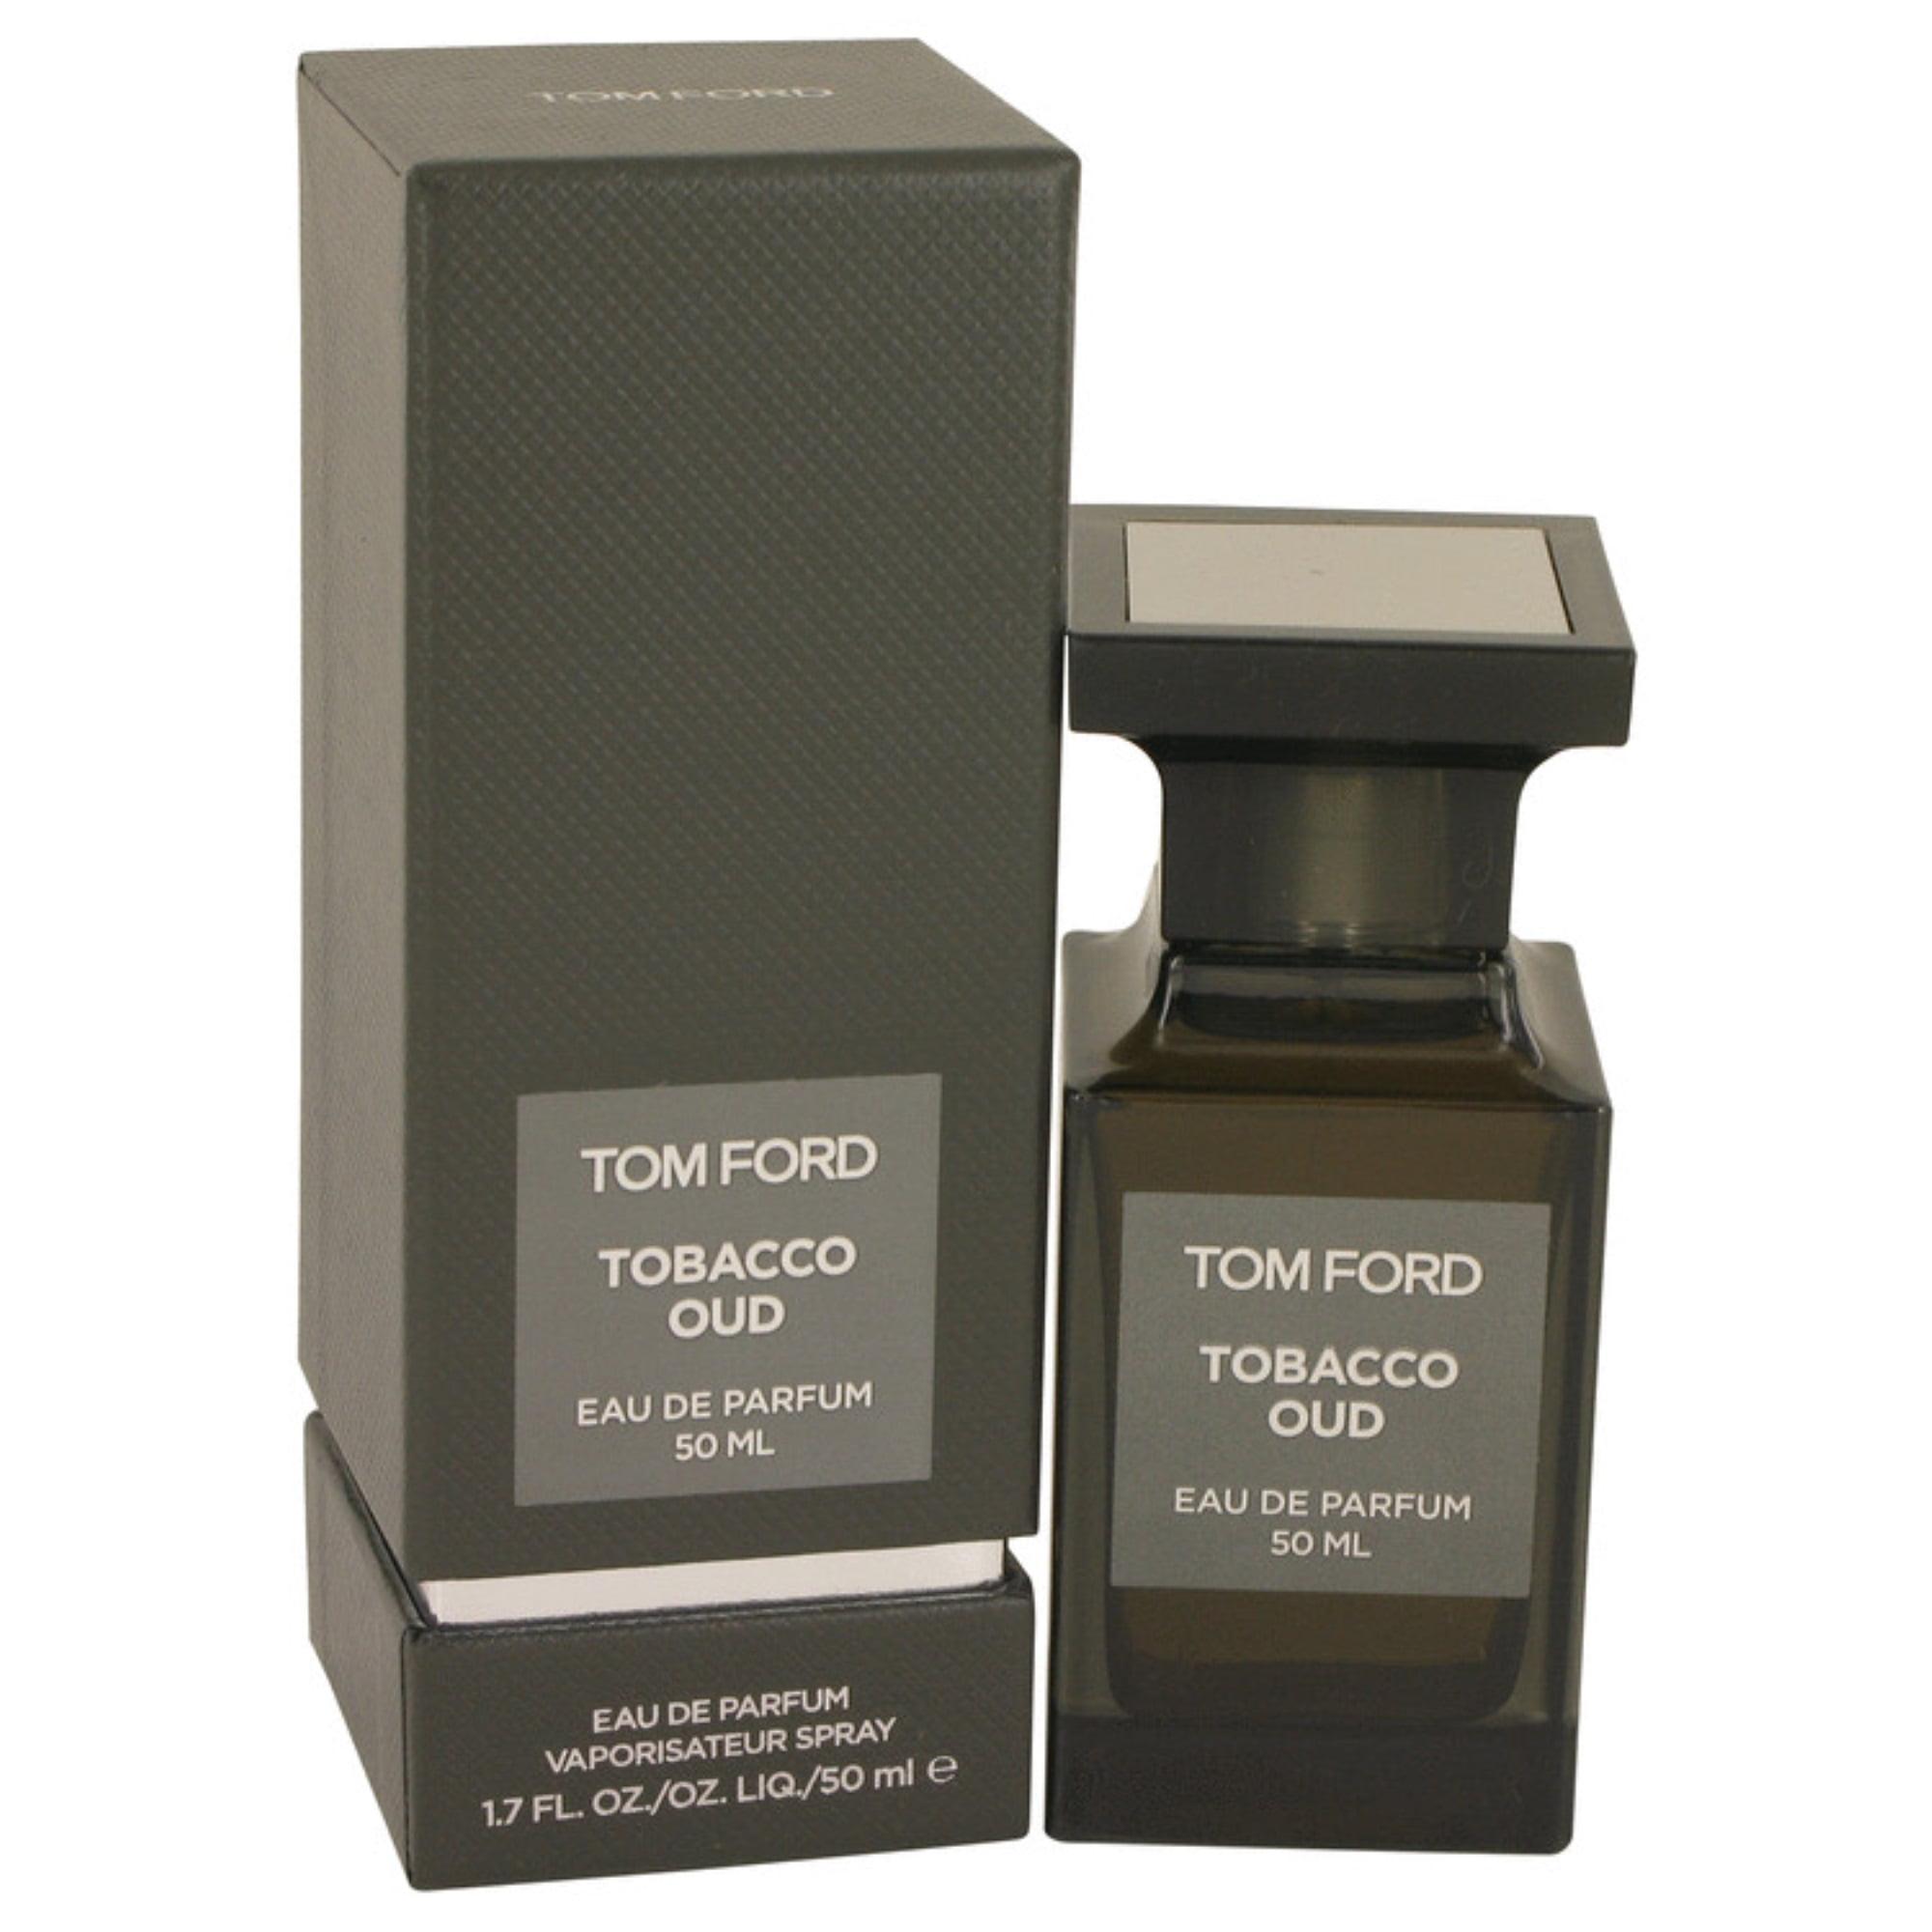 Tom Ford Tobacco Oud Perfume By Tom Ford 17 Oz Eau De Parfum Spray